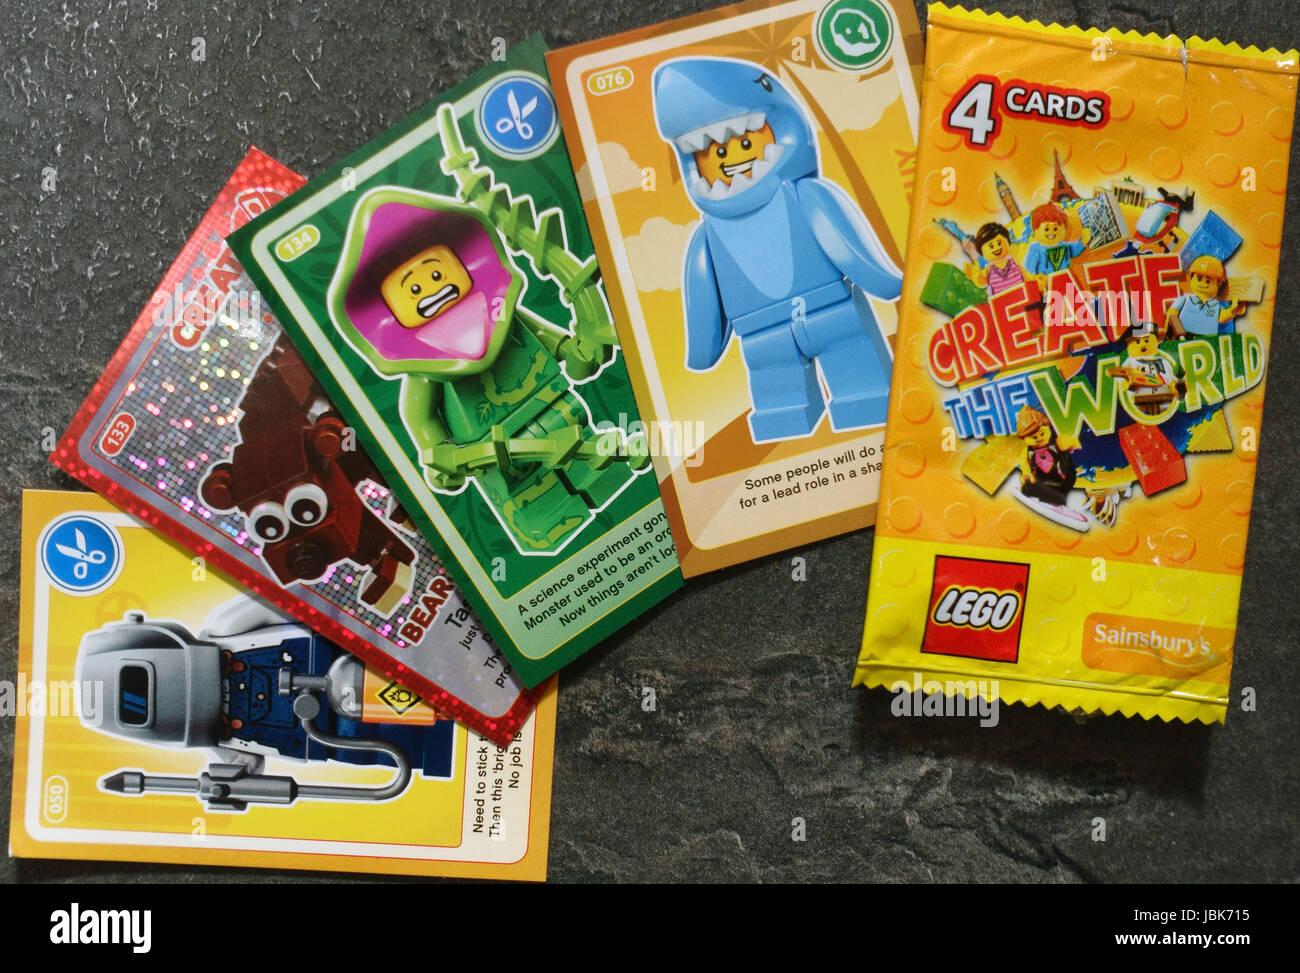 Create The World Lego trading cards, London - Stock Image